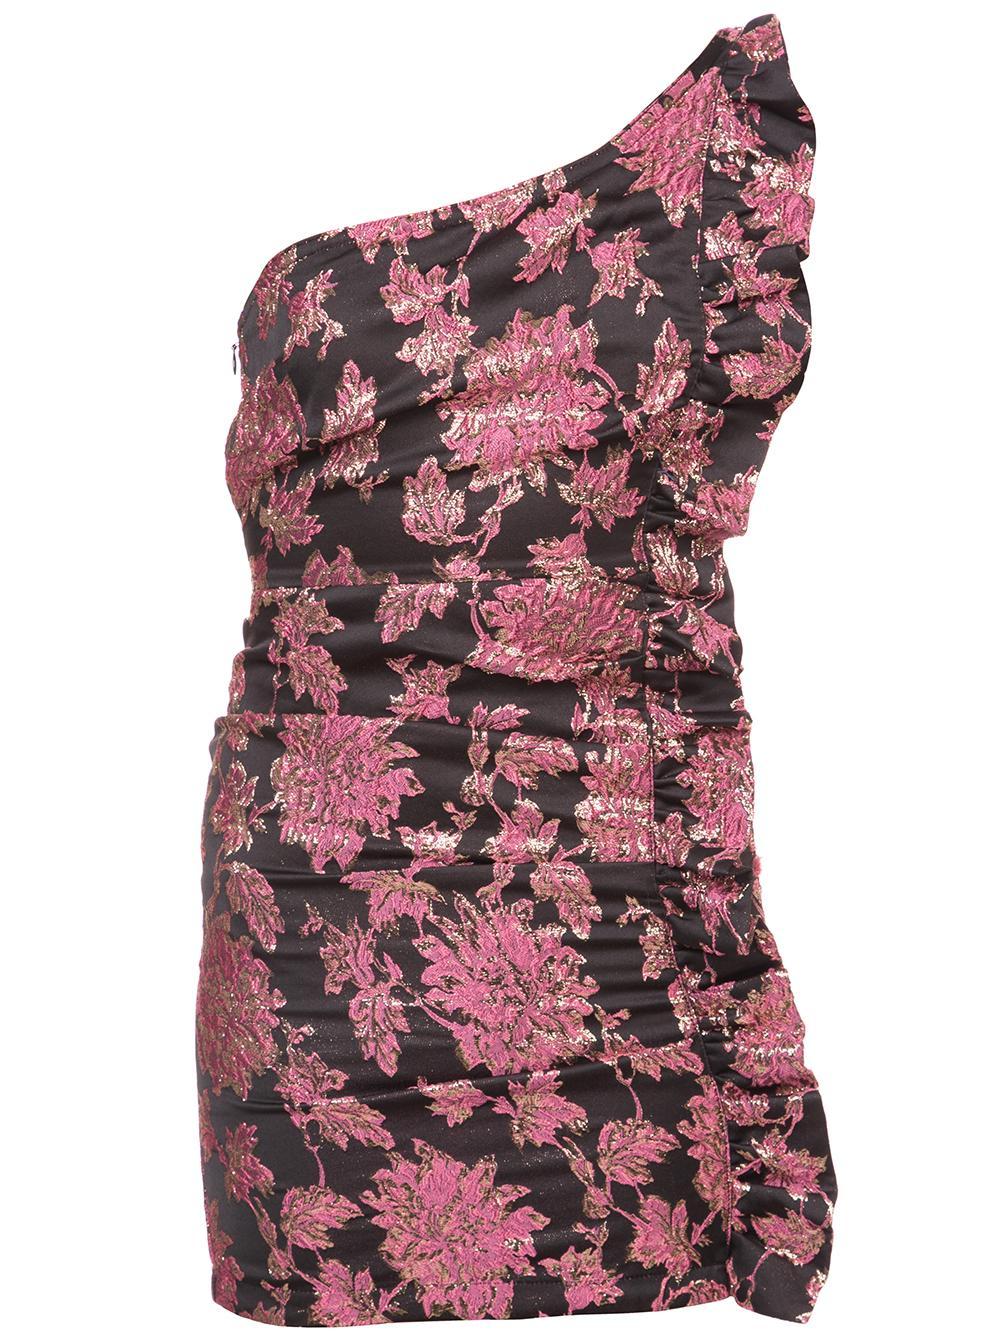 Luella Jacquard One Shoulder Mini Dress